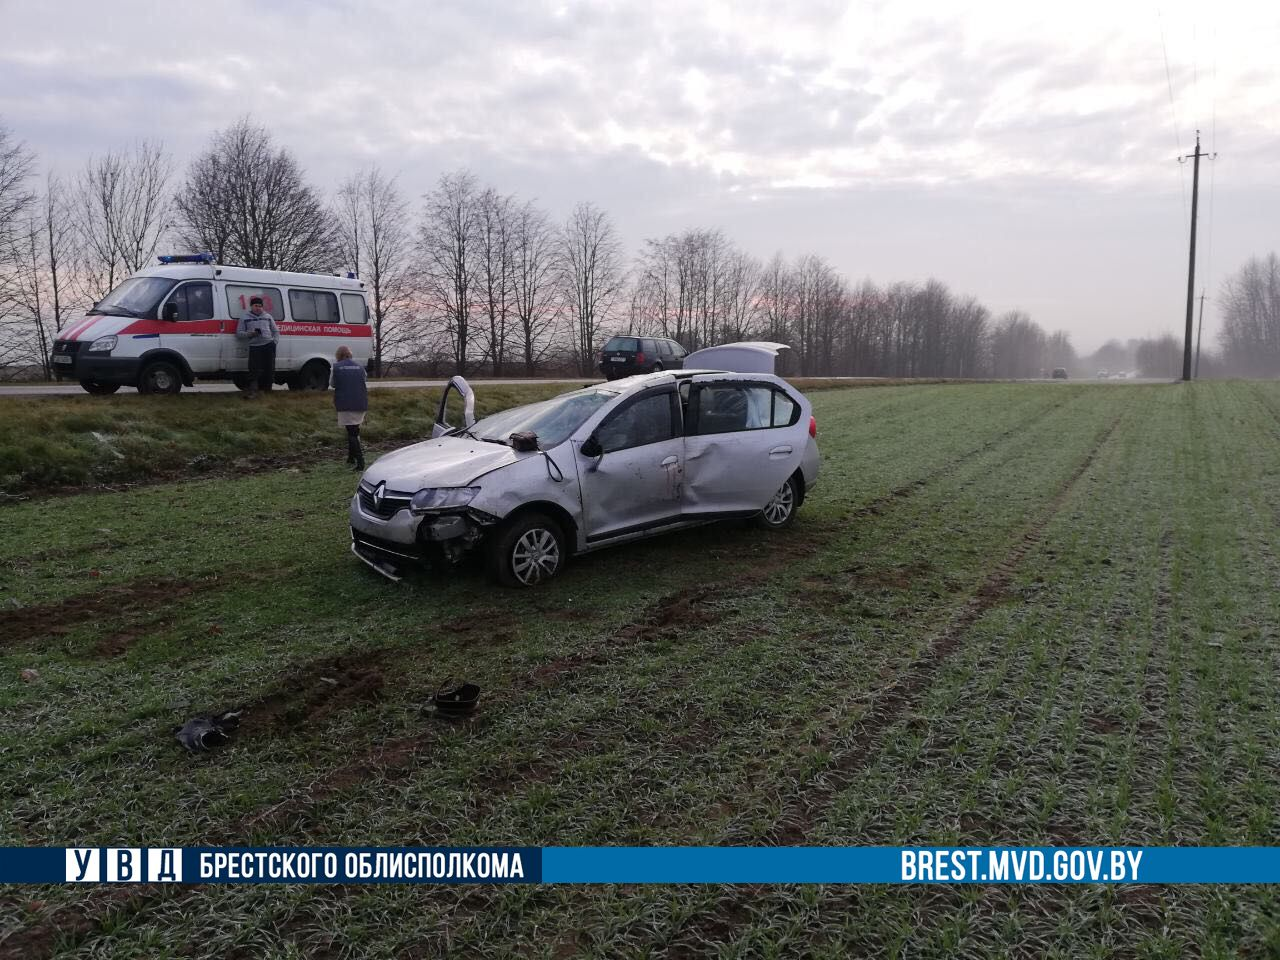 Погибла пассажирка «Рено Логан»: автомобиль перевернулся на автодороге Н-425